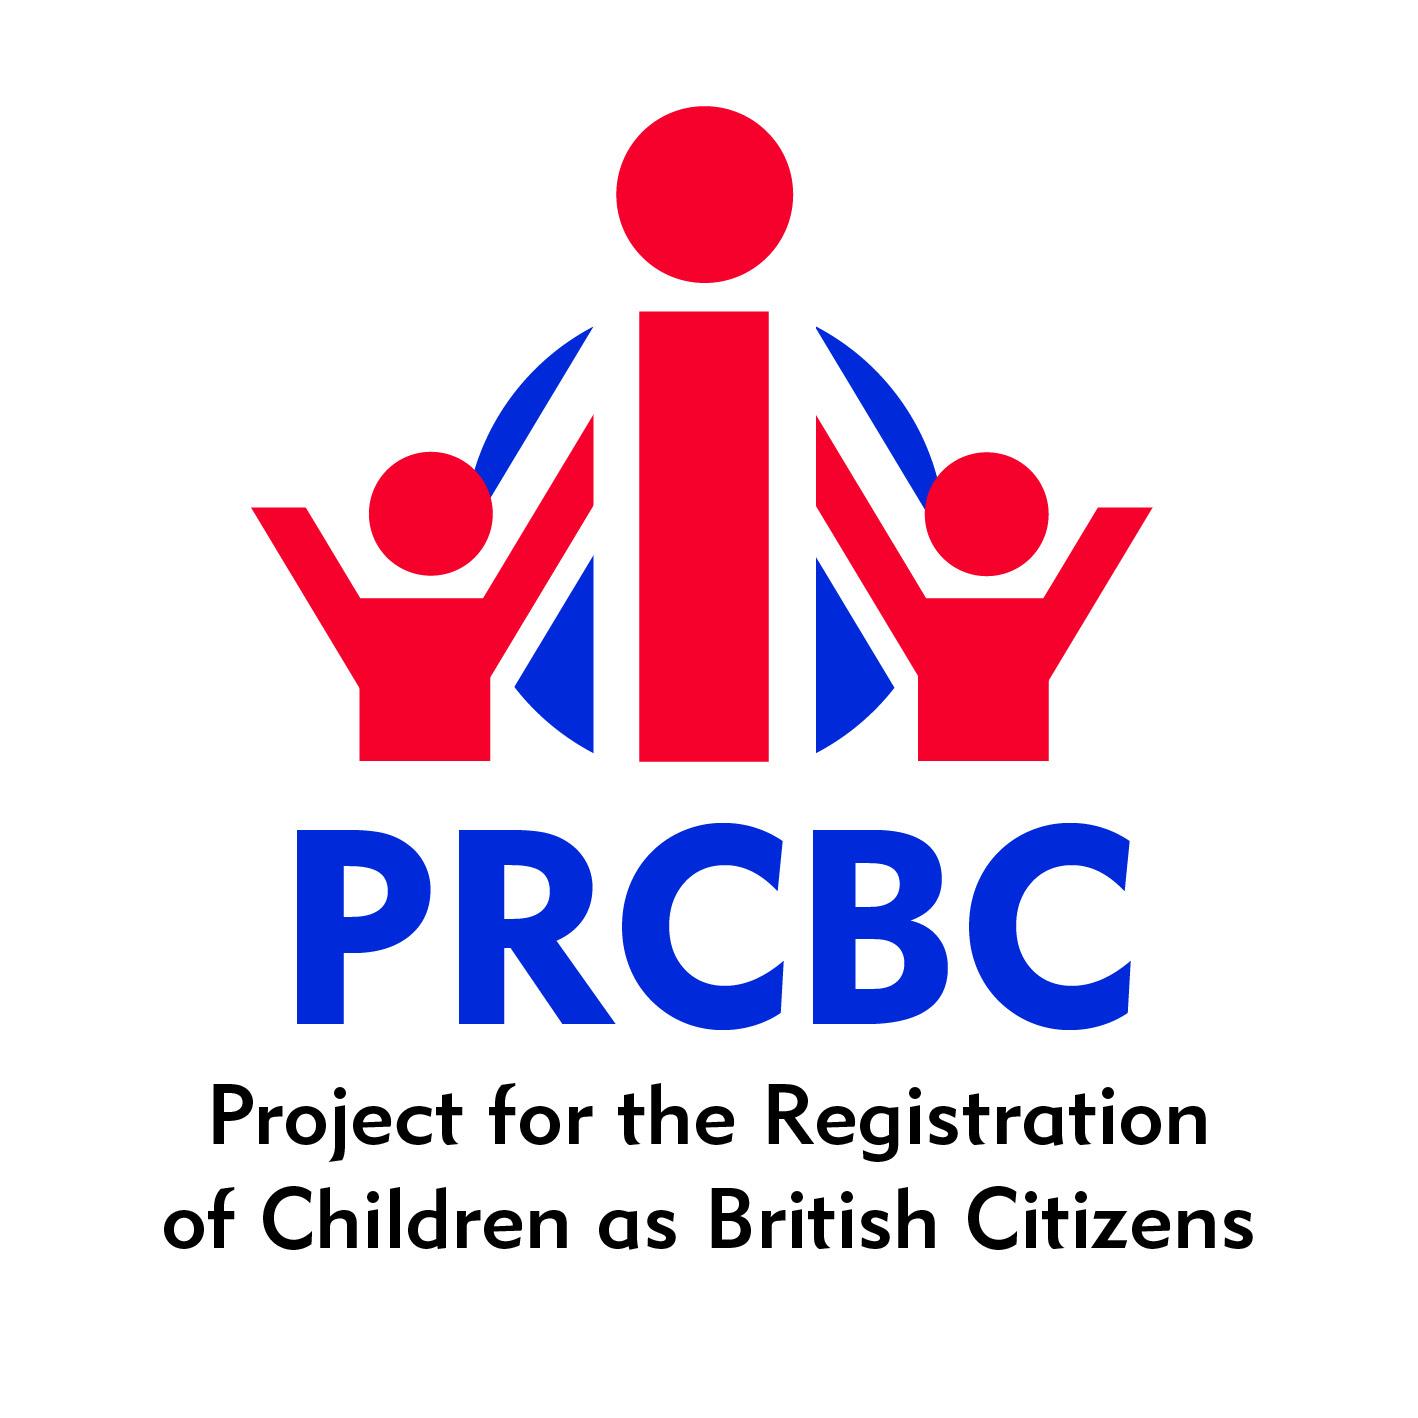 PRCBC_logo_for_print